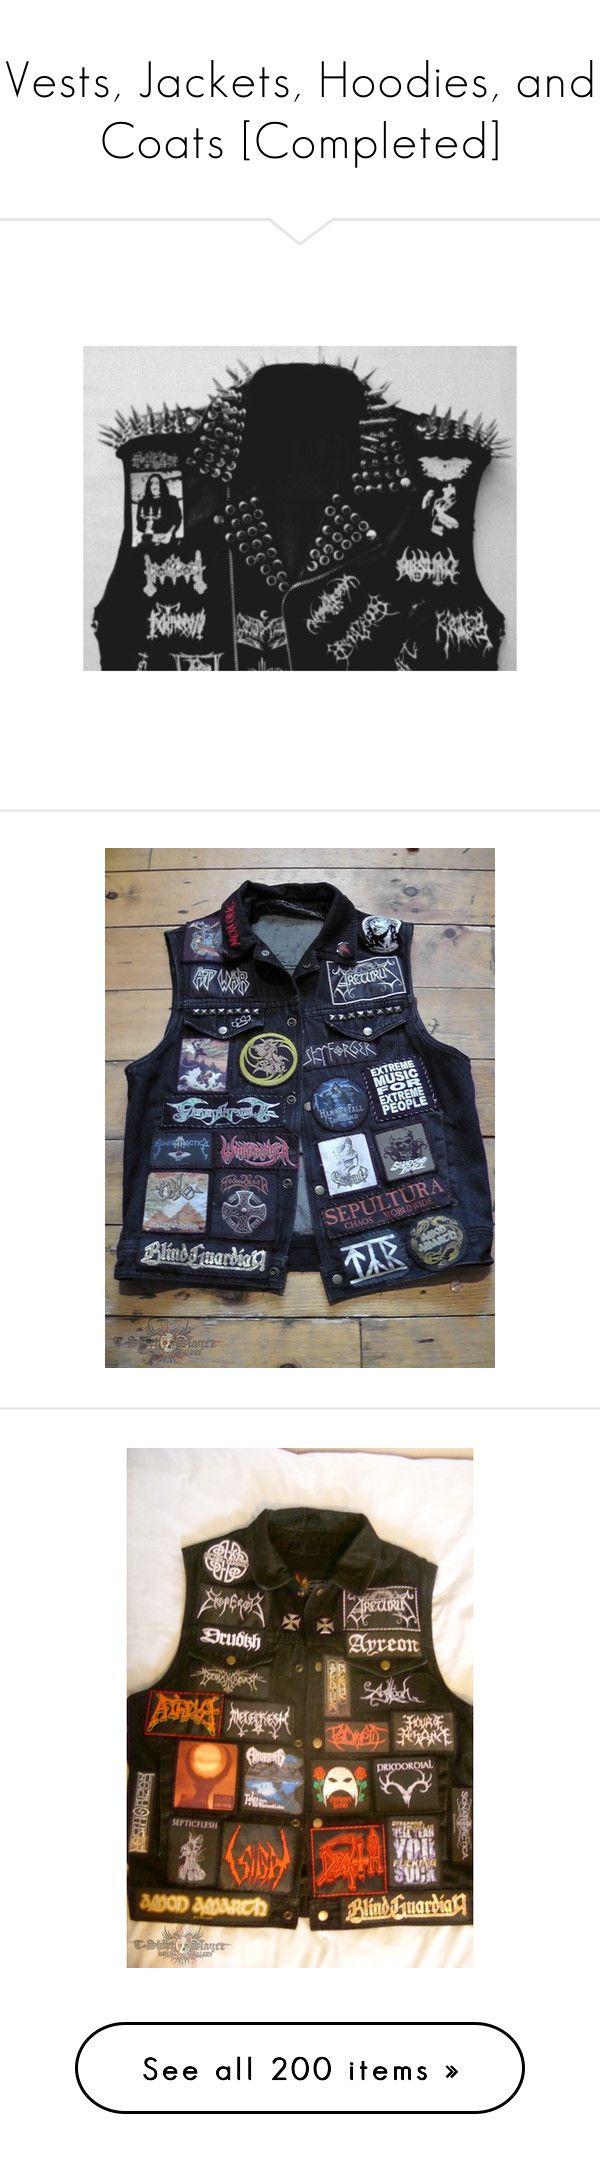 Best 25+ Metallic vests ideas on Pinterest | Leather vest mens ...